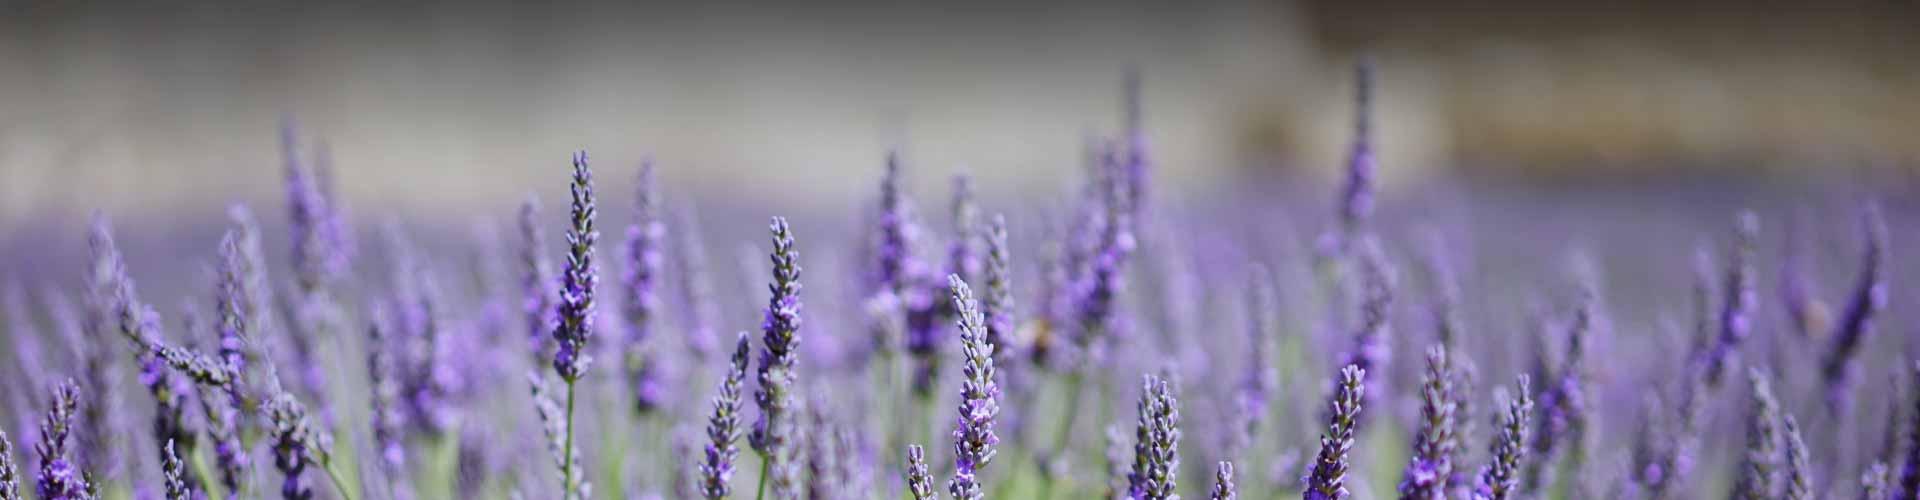 Lavendel | Wellness Kosmetik-Studio Stettfurt Frauenfeld